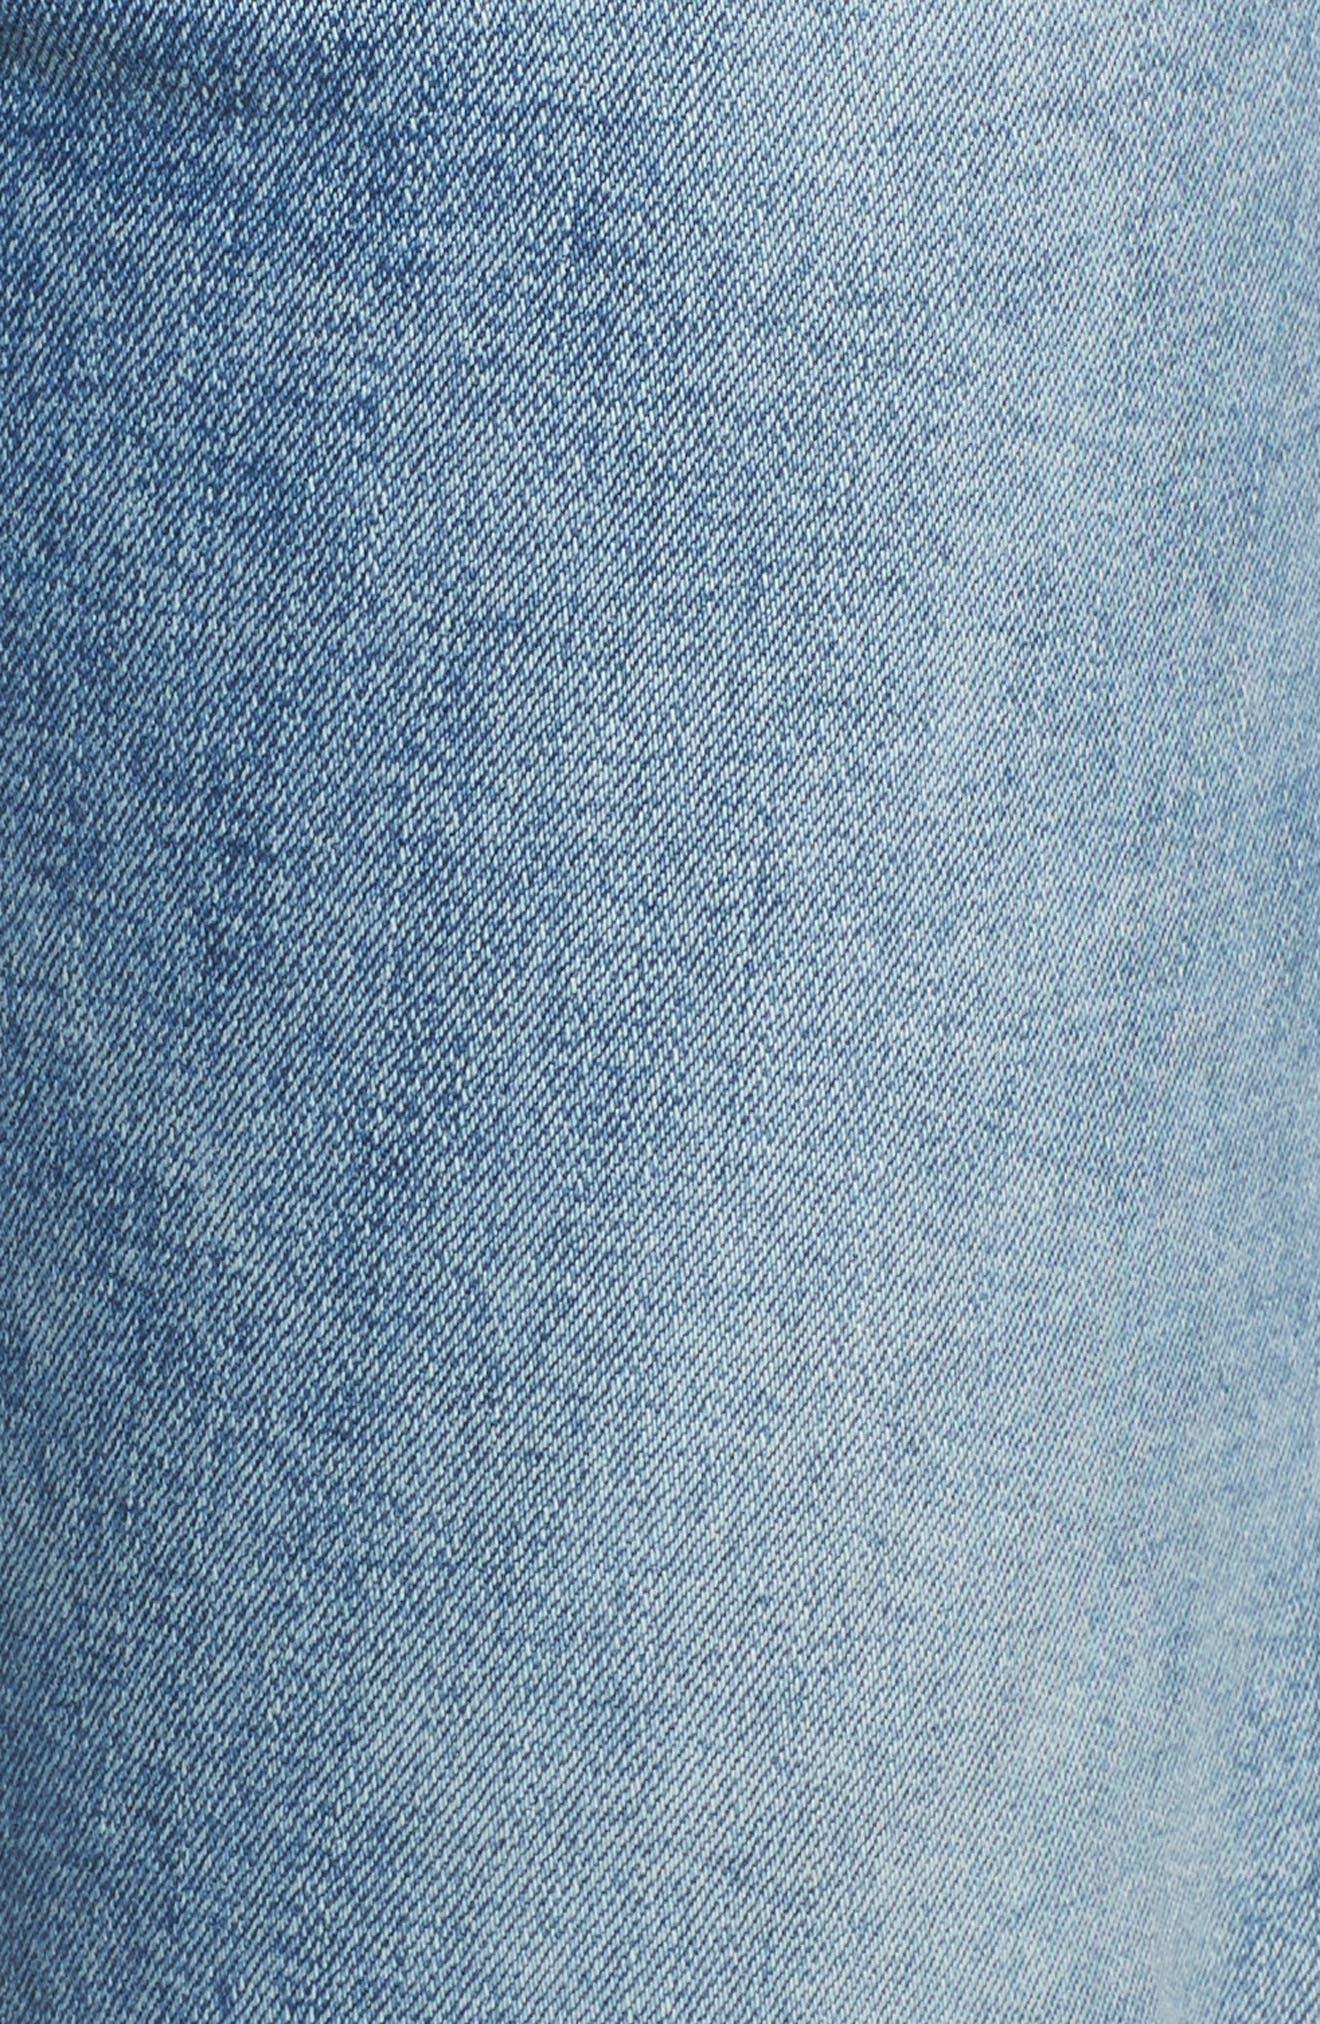 Bella Vintage Ankle Skinny Jeans,                             Alternate thumbnail 5, color,                             430